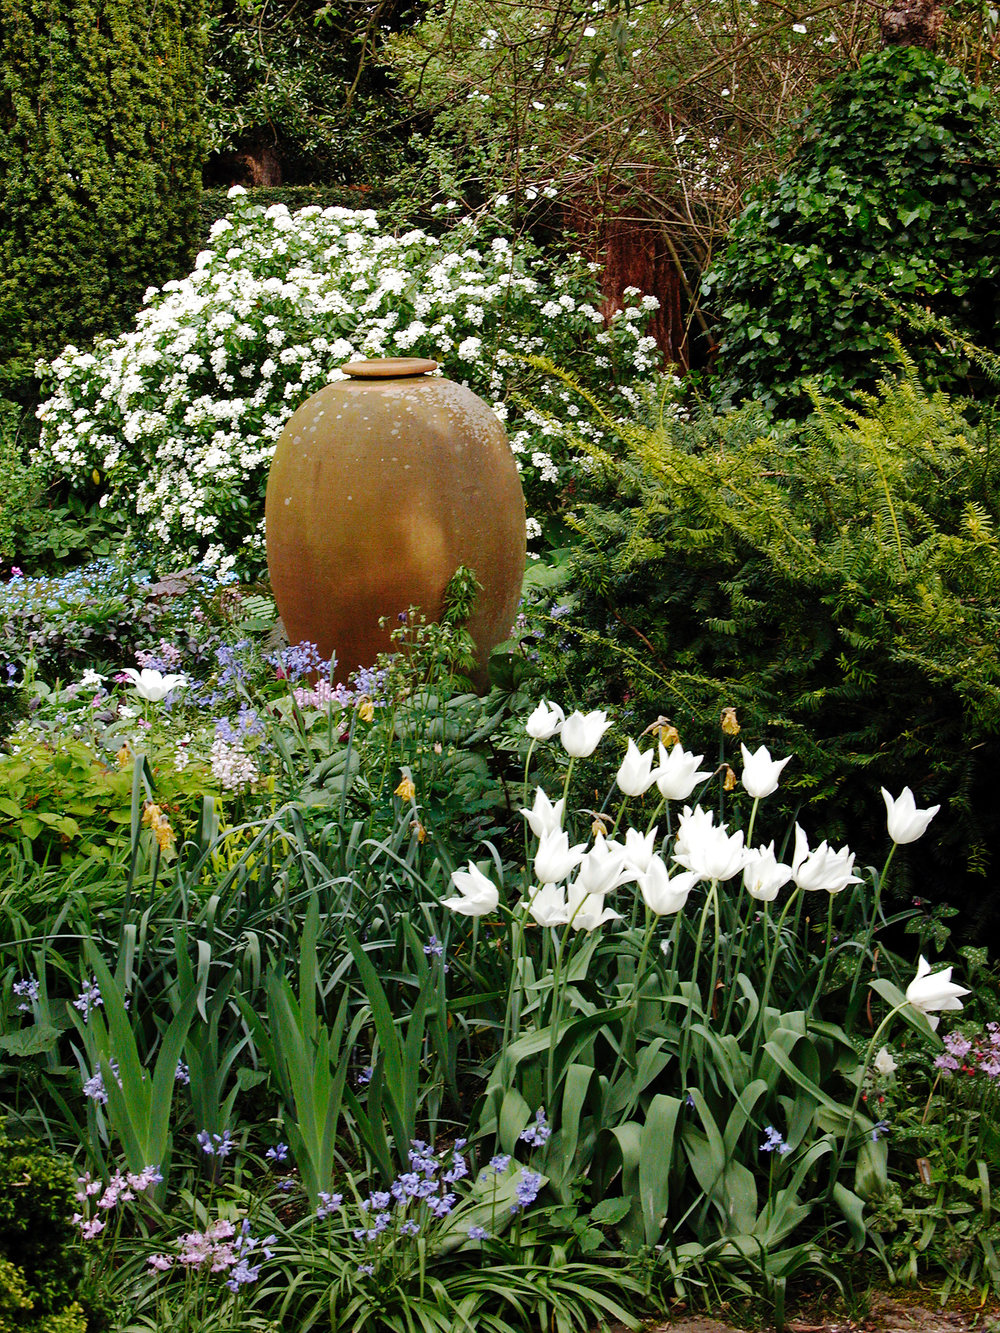 '07TurnEnd,MonicaYoungUrn,Choisya,TulipaWhiteTriumphator.jpg